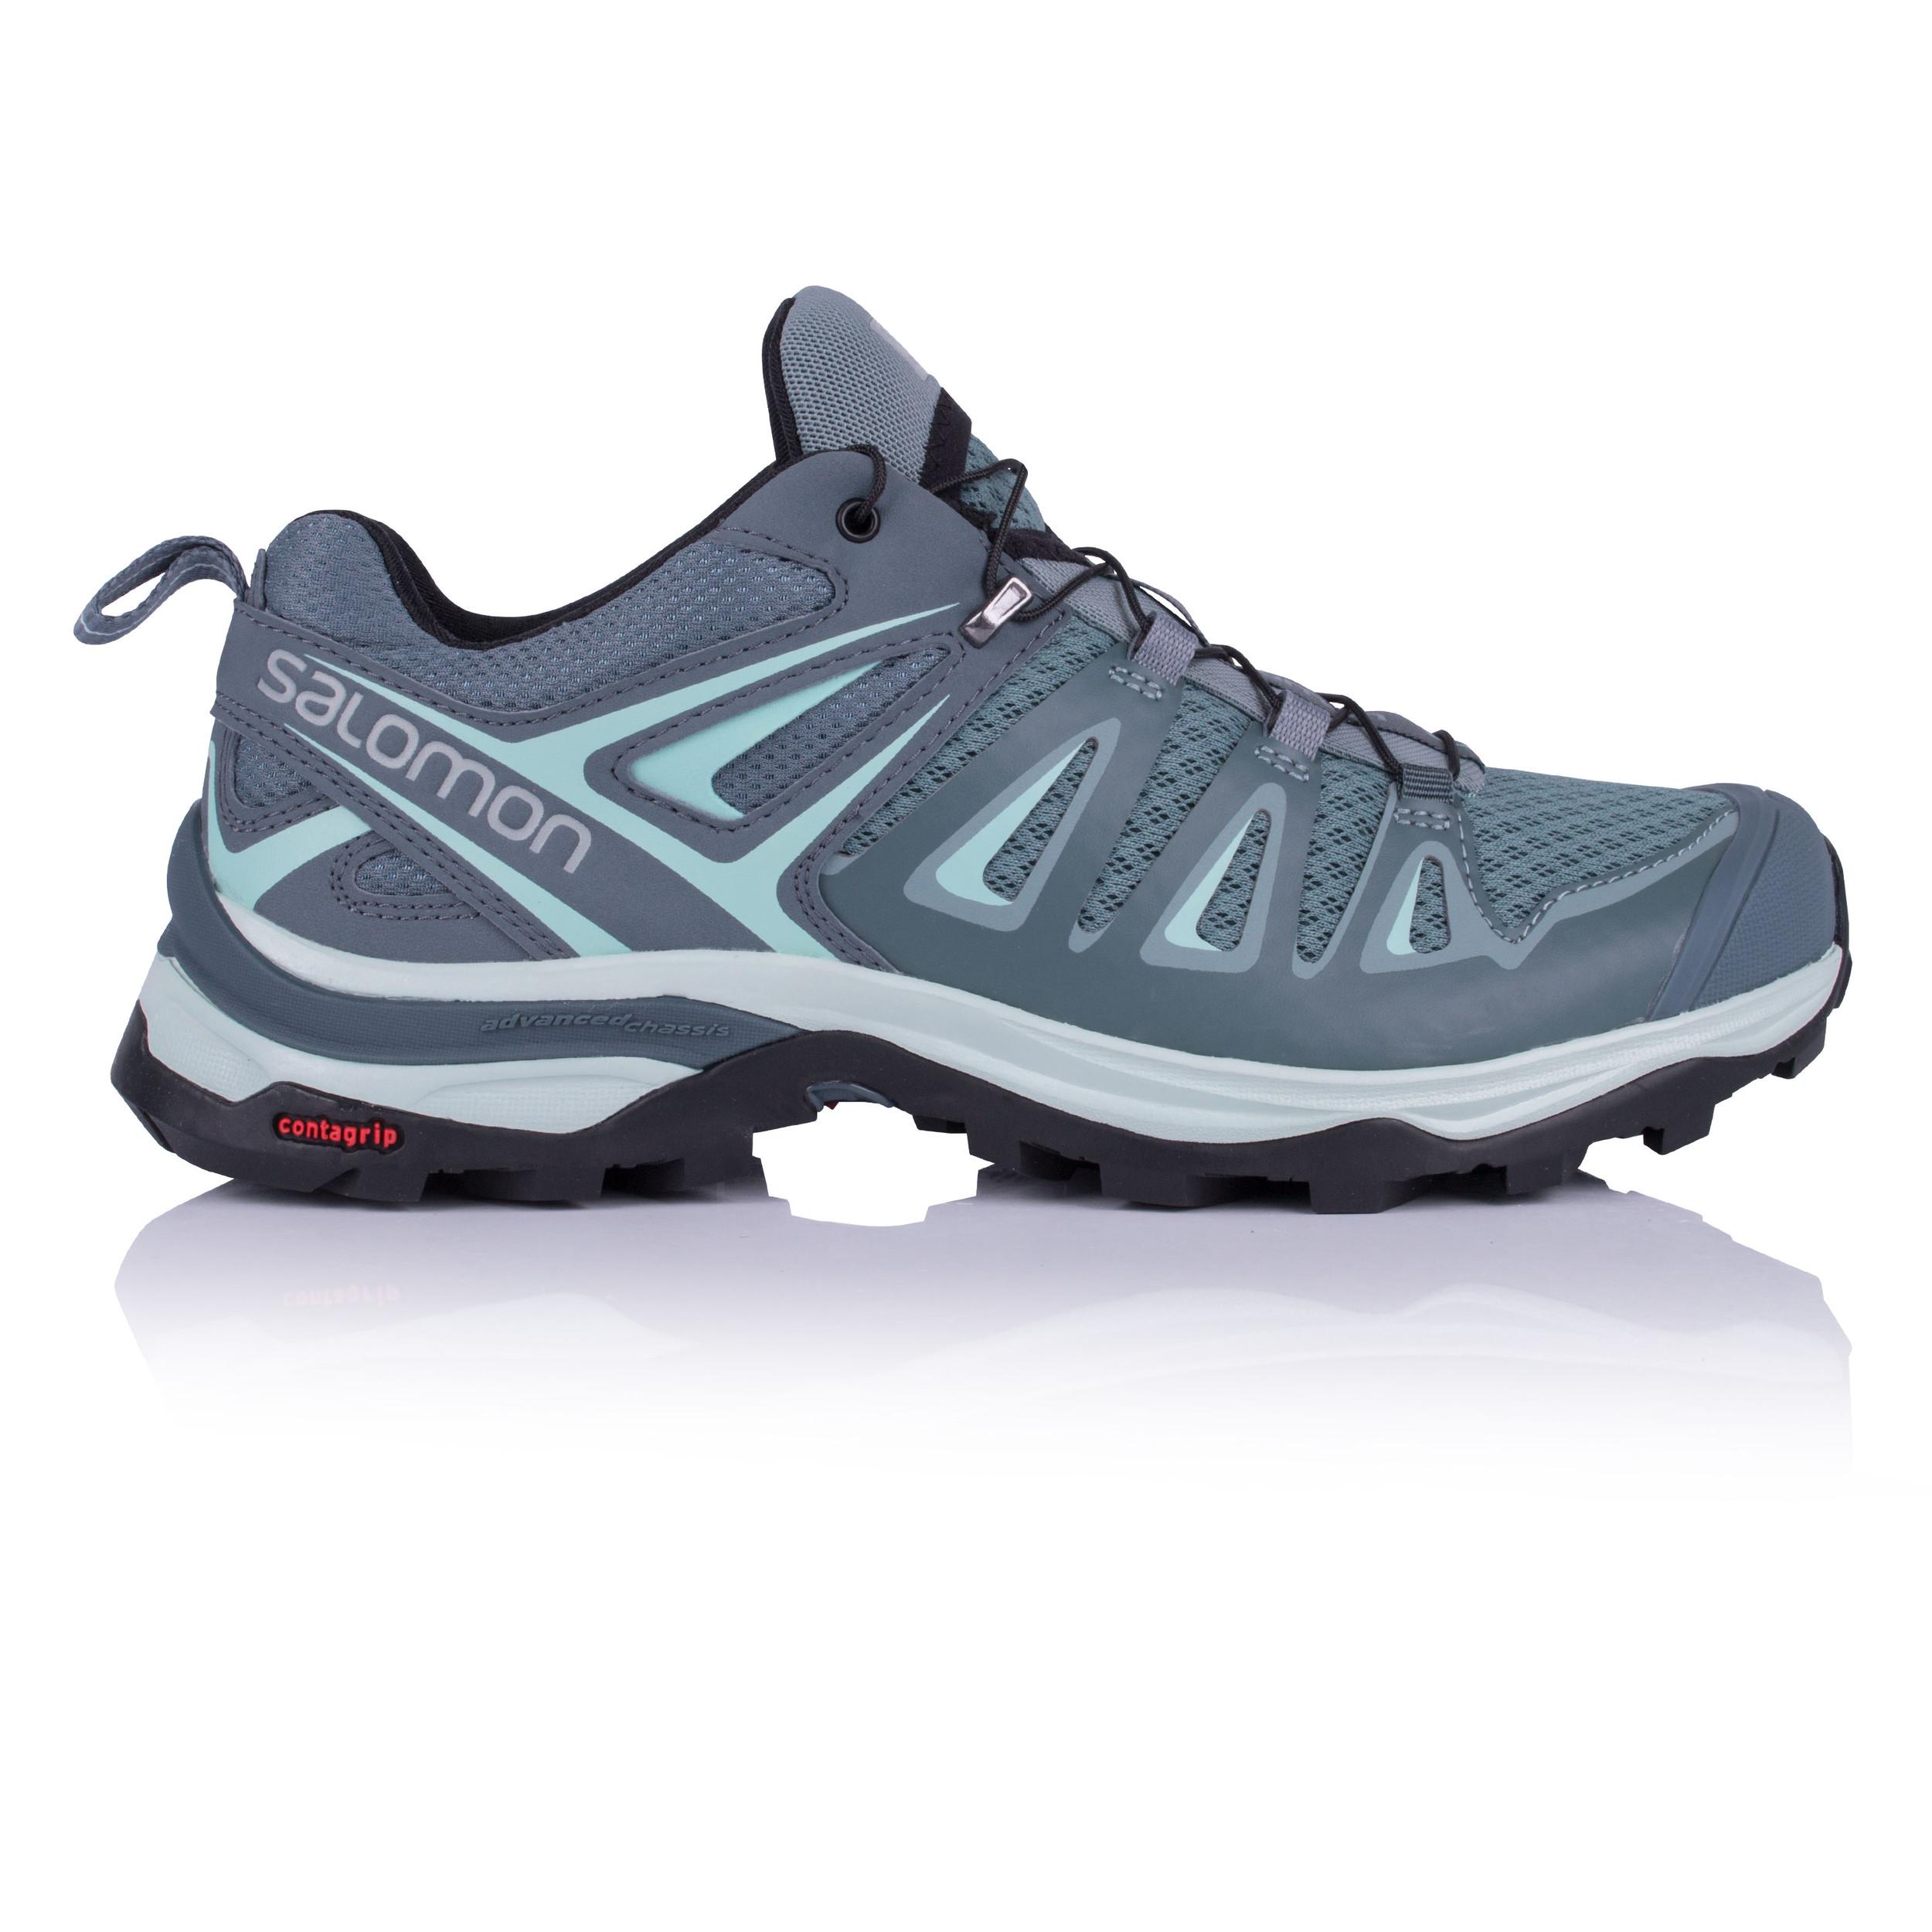 Salomon Damenschuhe X Ultra 3 Walking Schuhe Blau Sports Outdoors Breathable Trainers